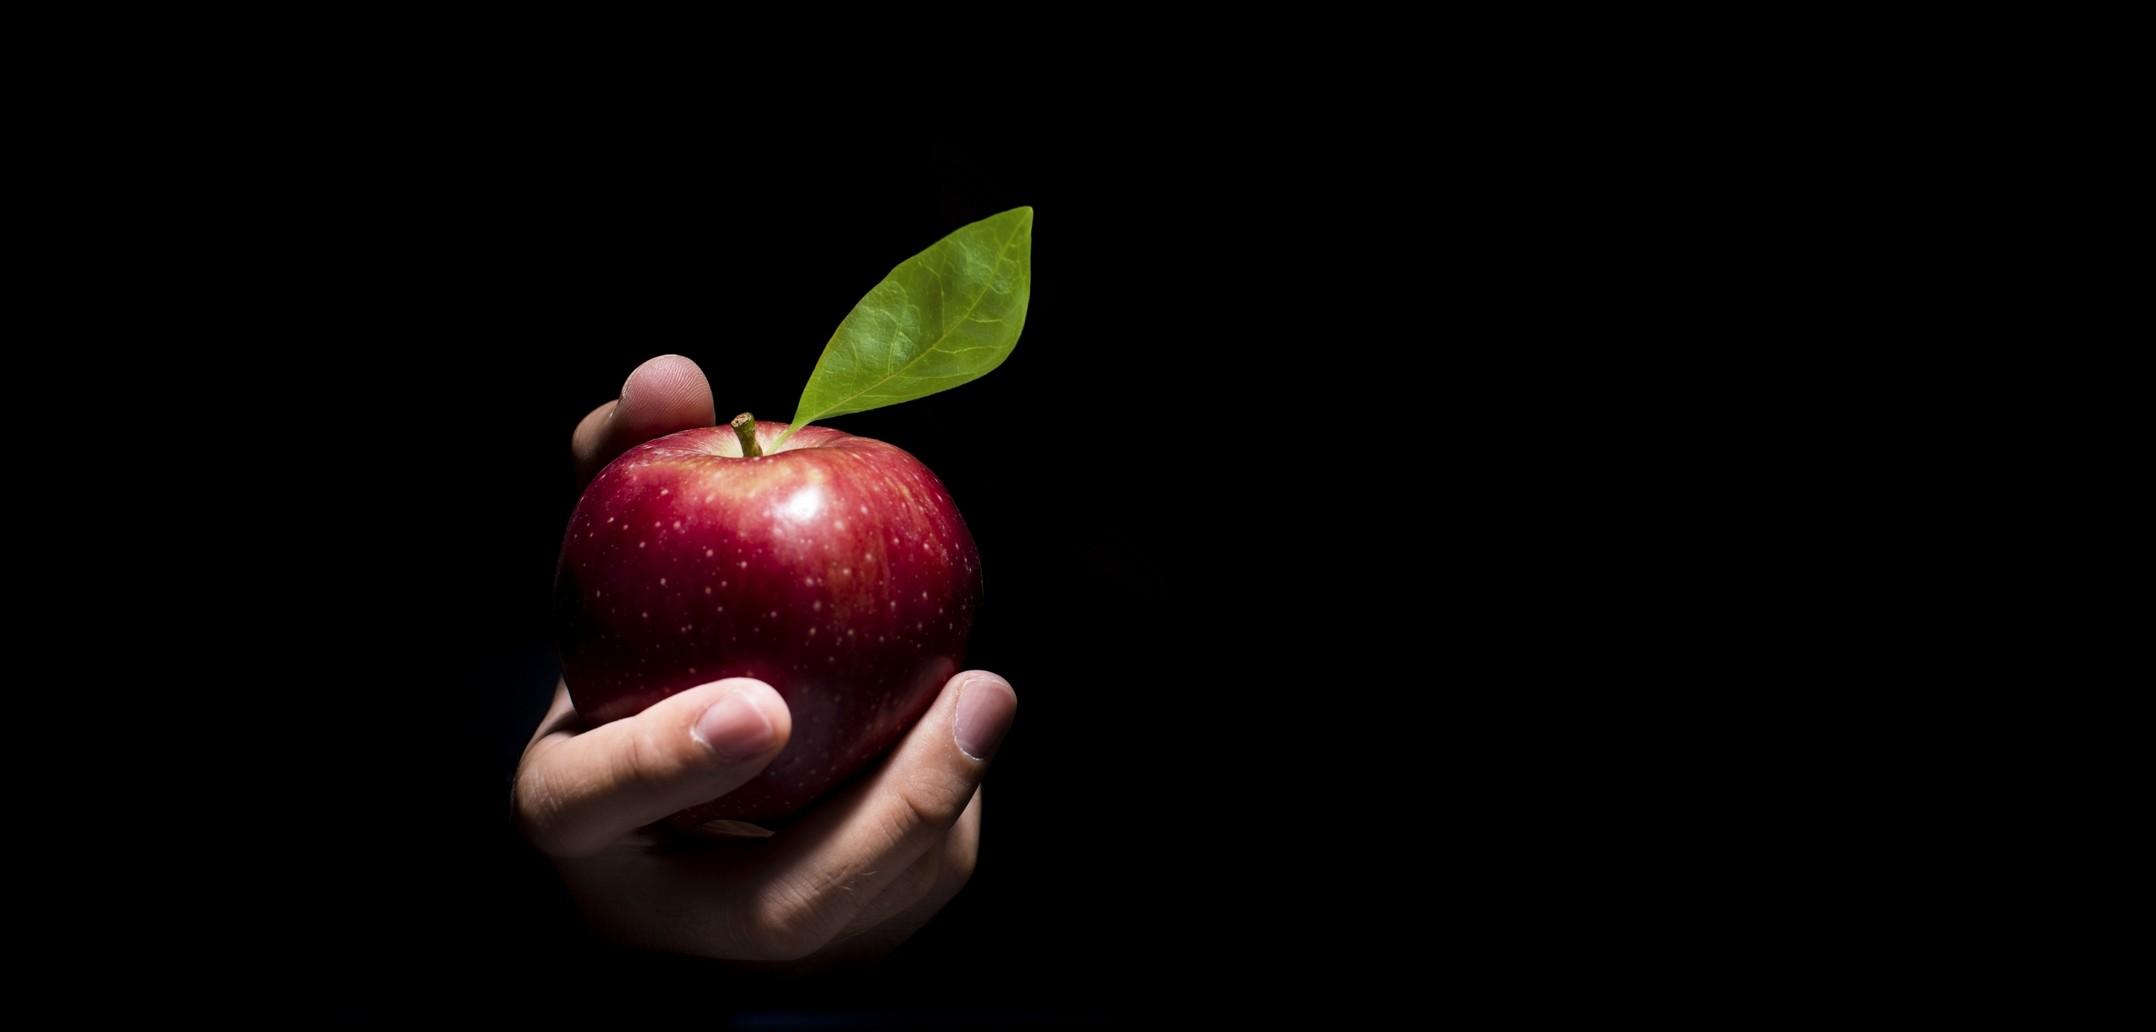 apple stock ana